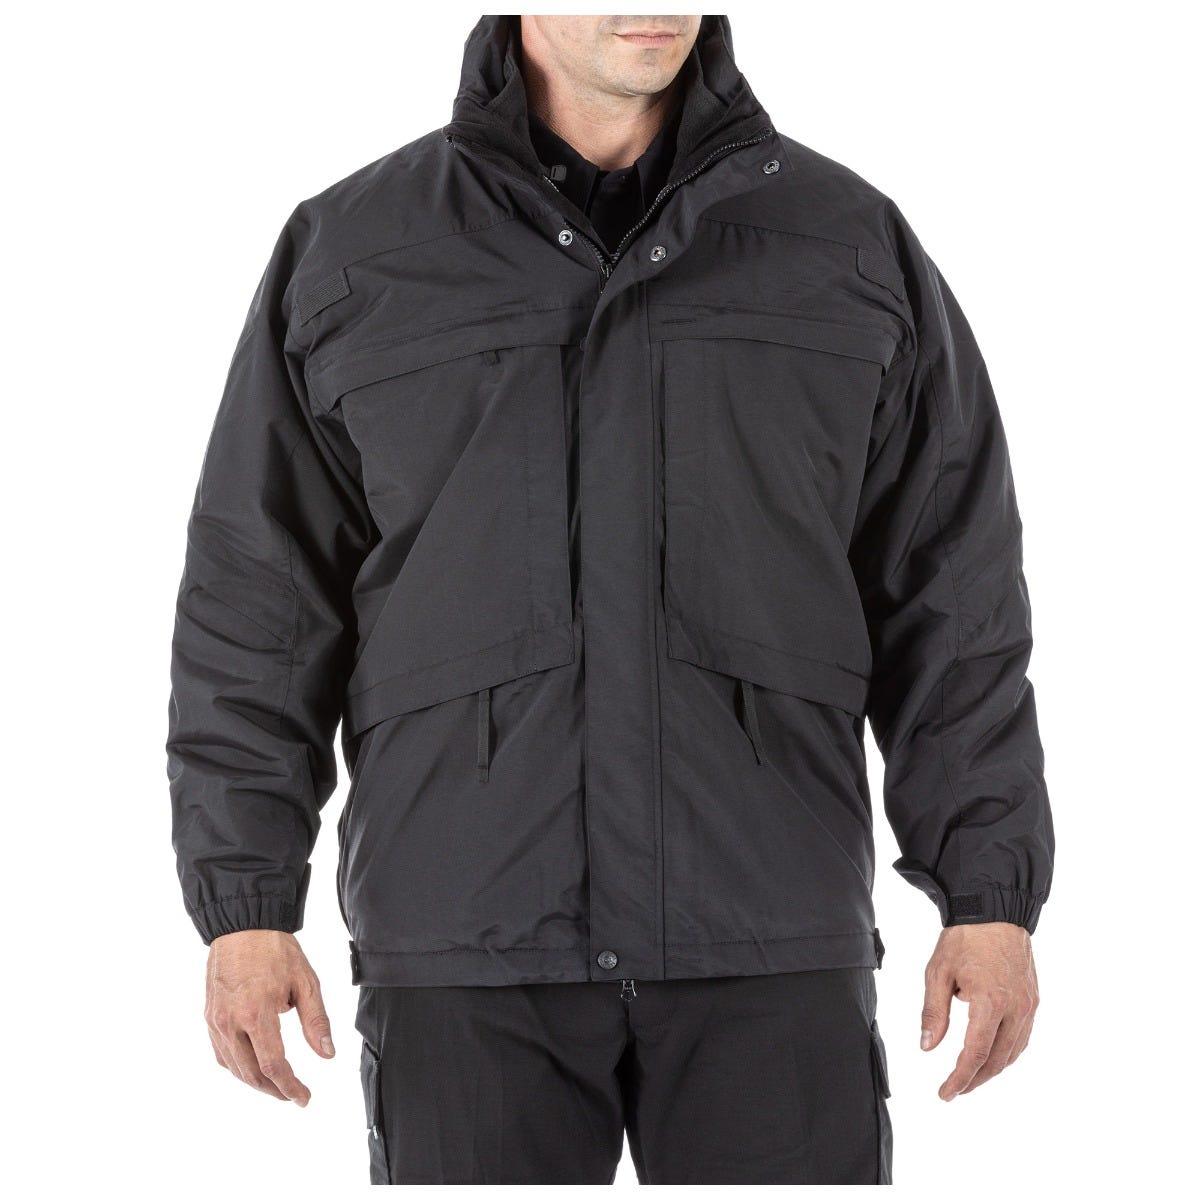 5.11 Tactical Men's 3-in-1 Parka Jacket™ (Black) thumbnail